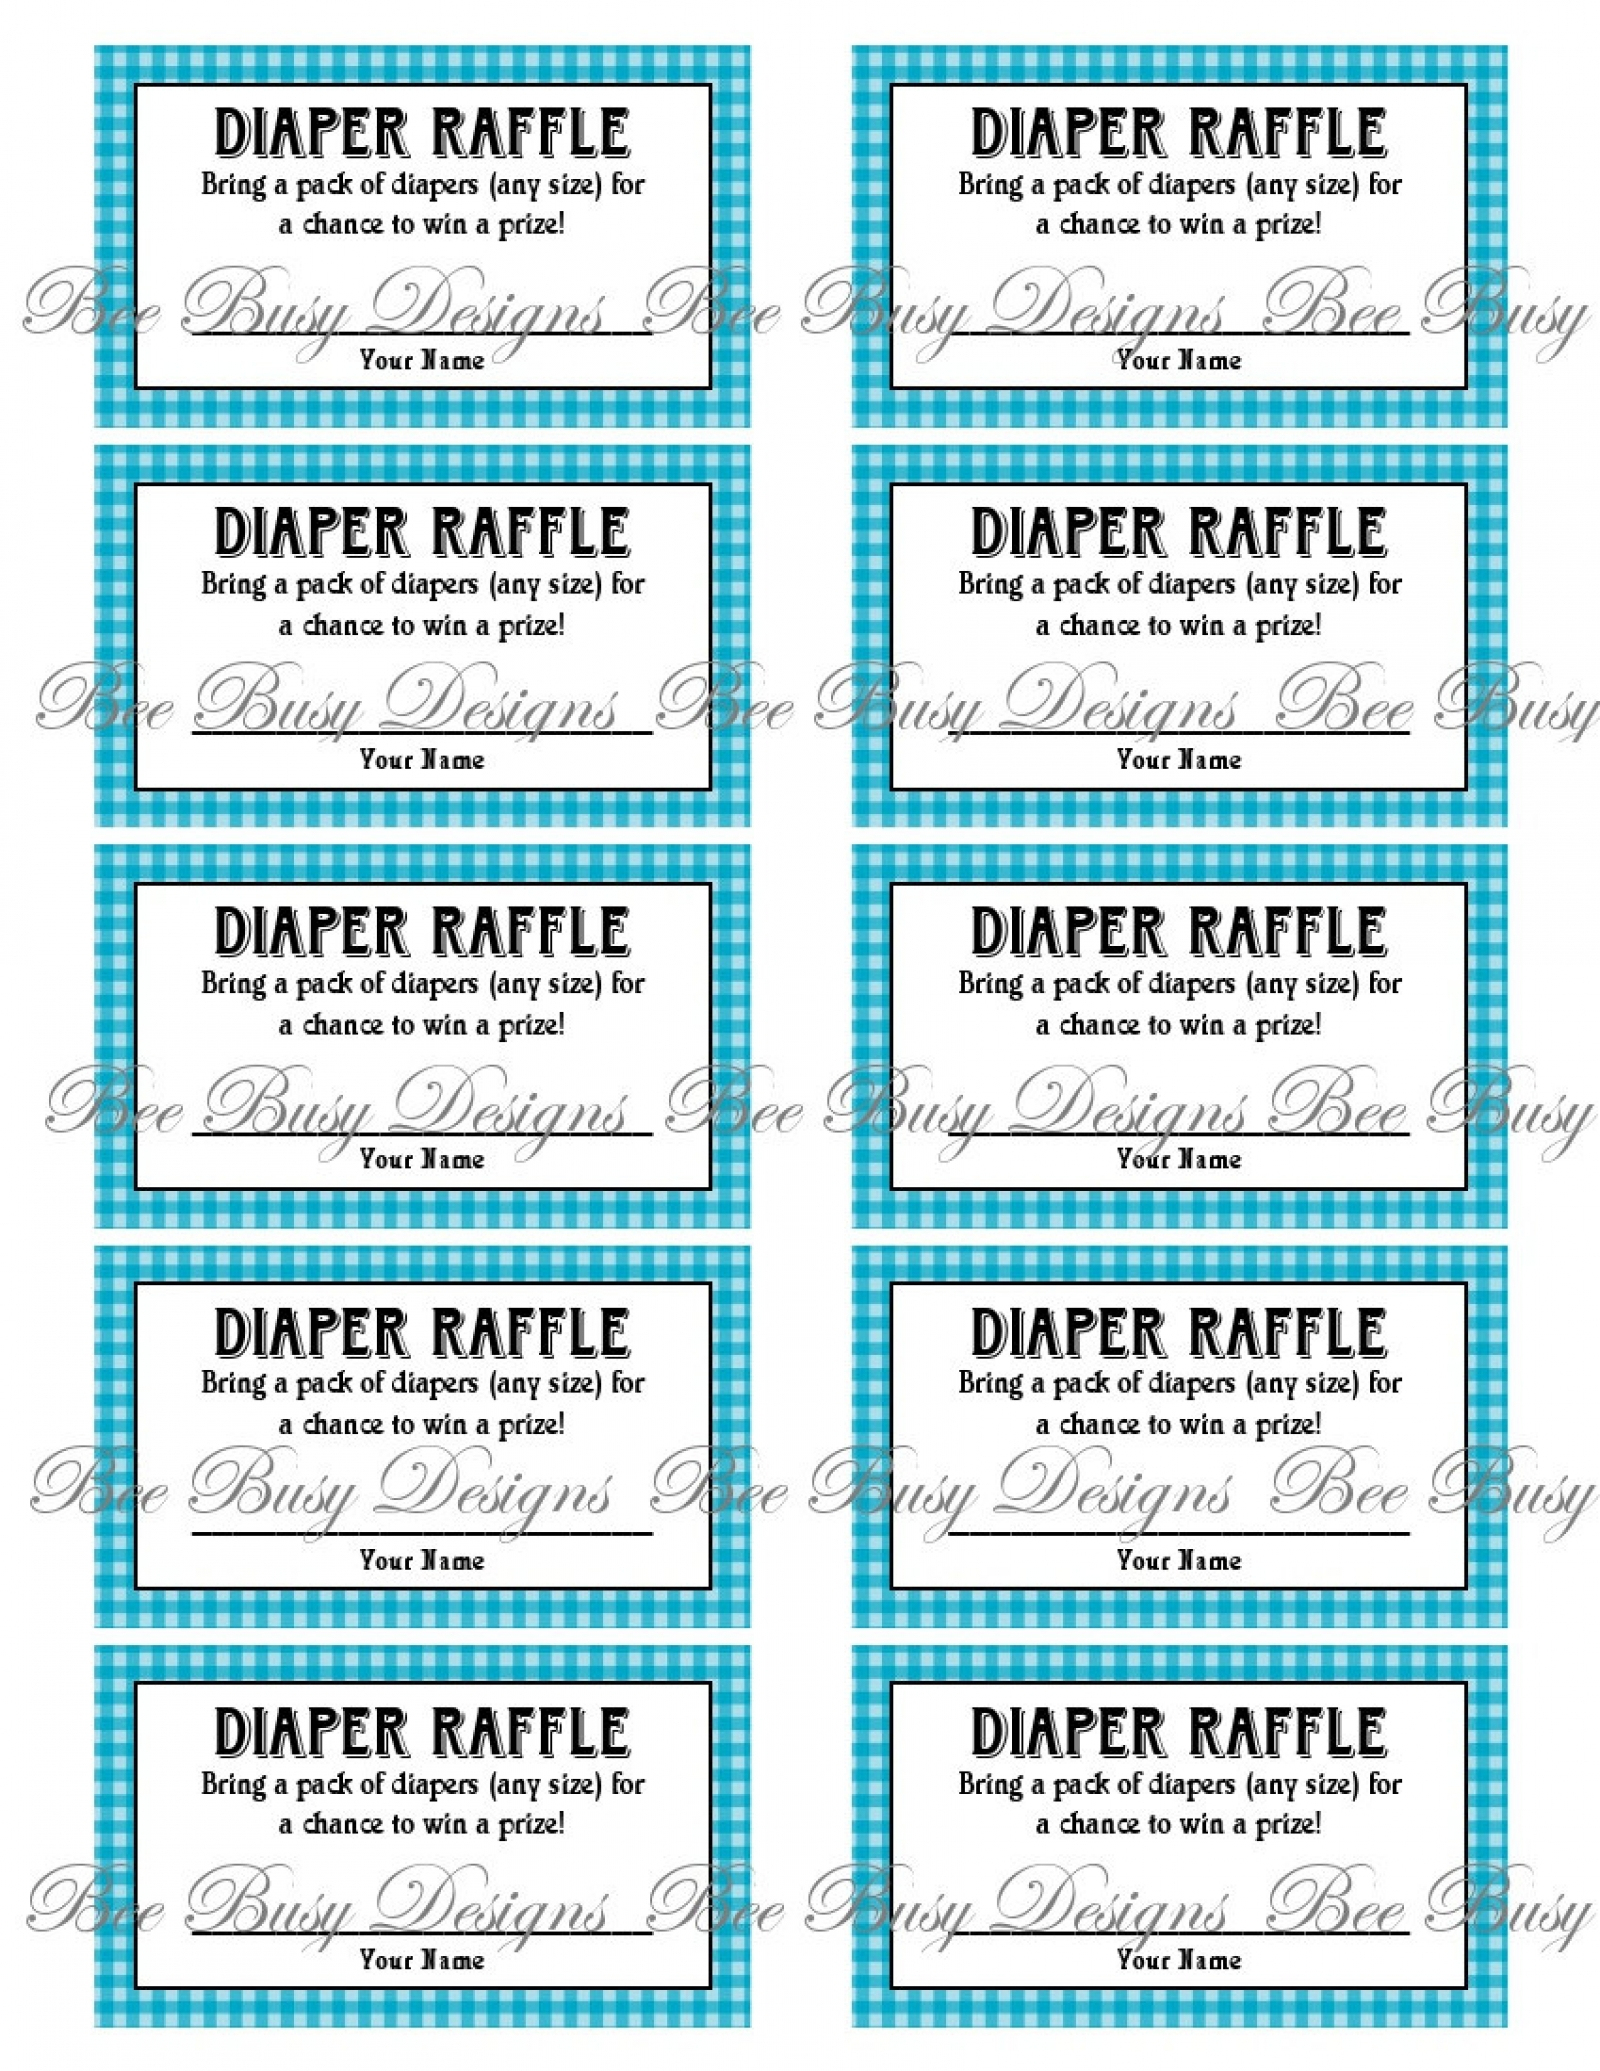 008 Diaper Raffle Tickets Template Ideas ~ Ulyssesroom - Free Printable Diaper Raffle Tickets